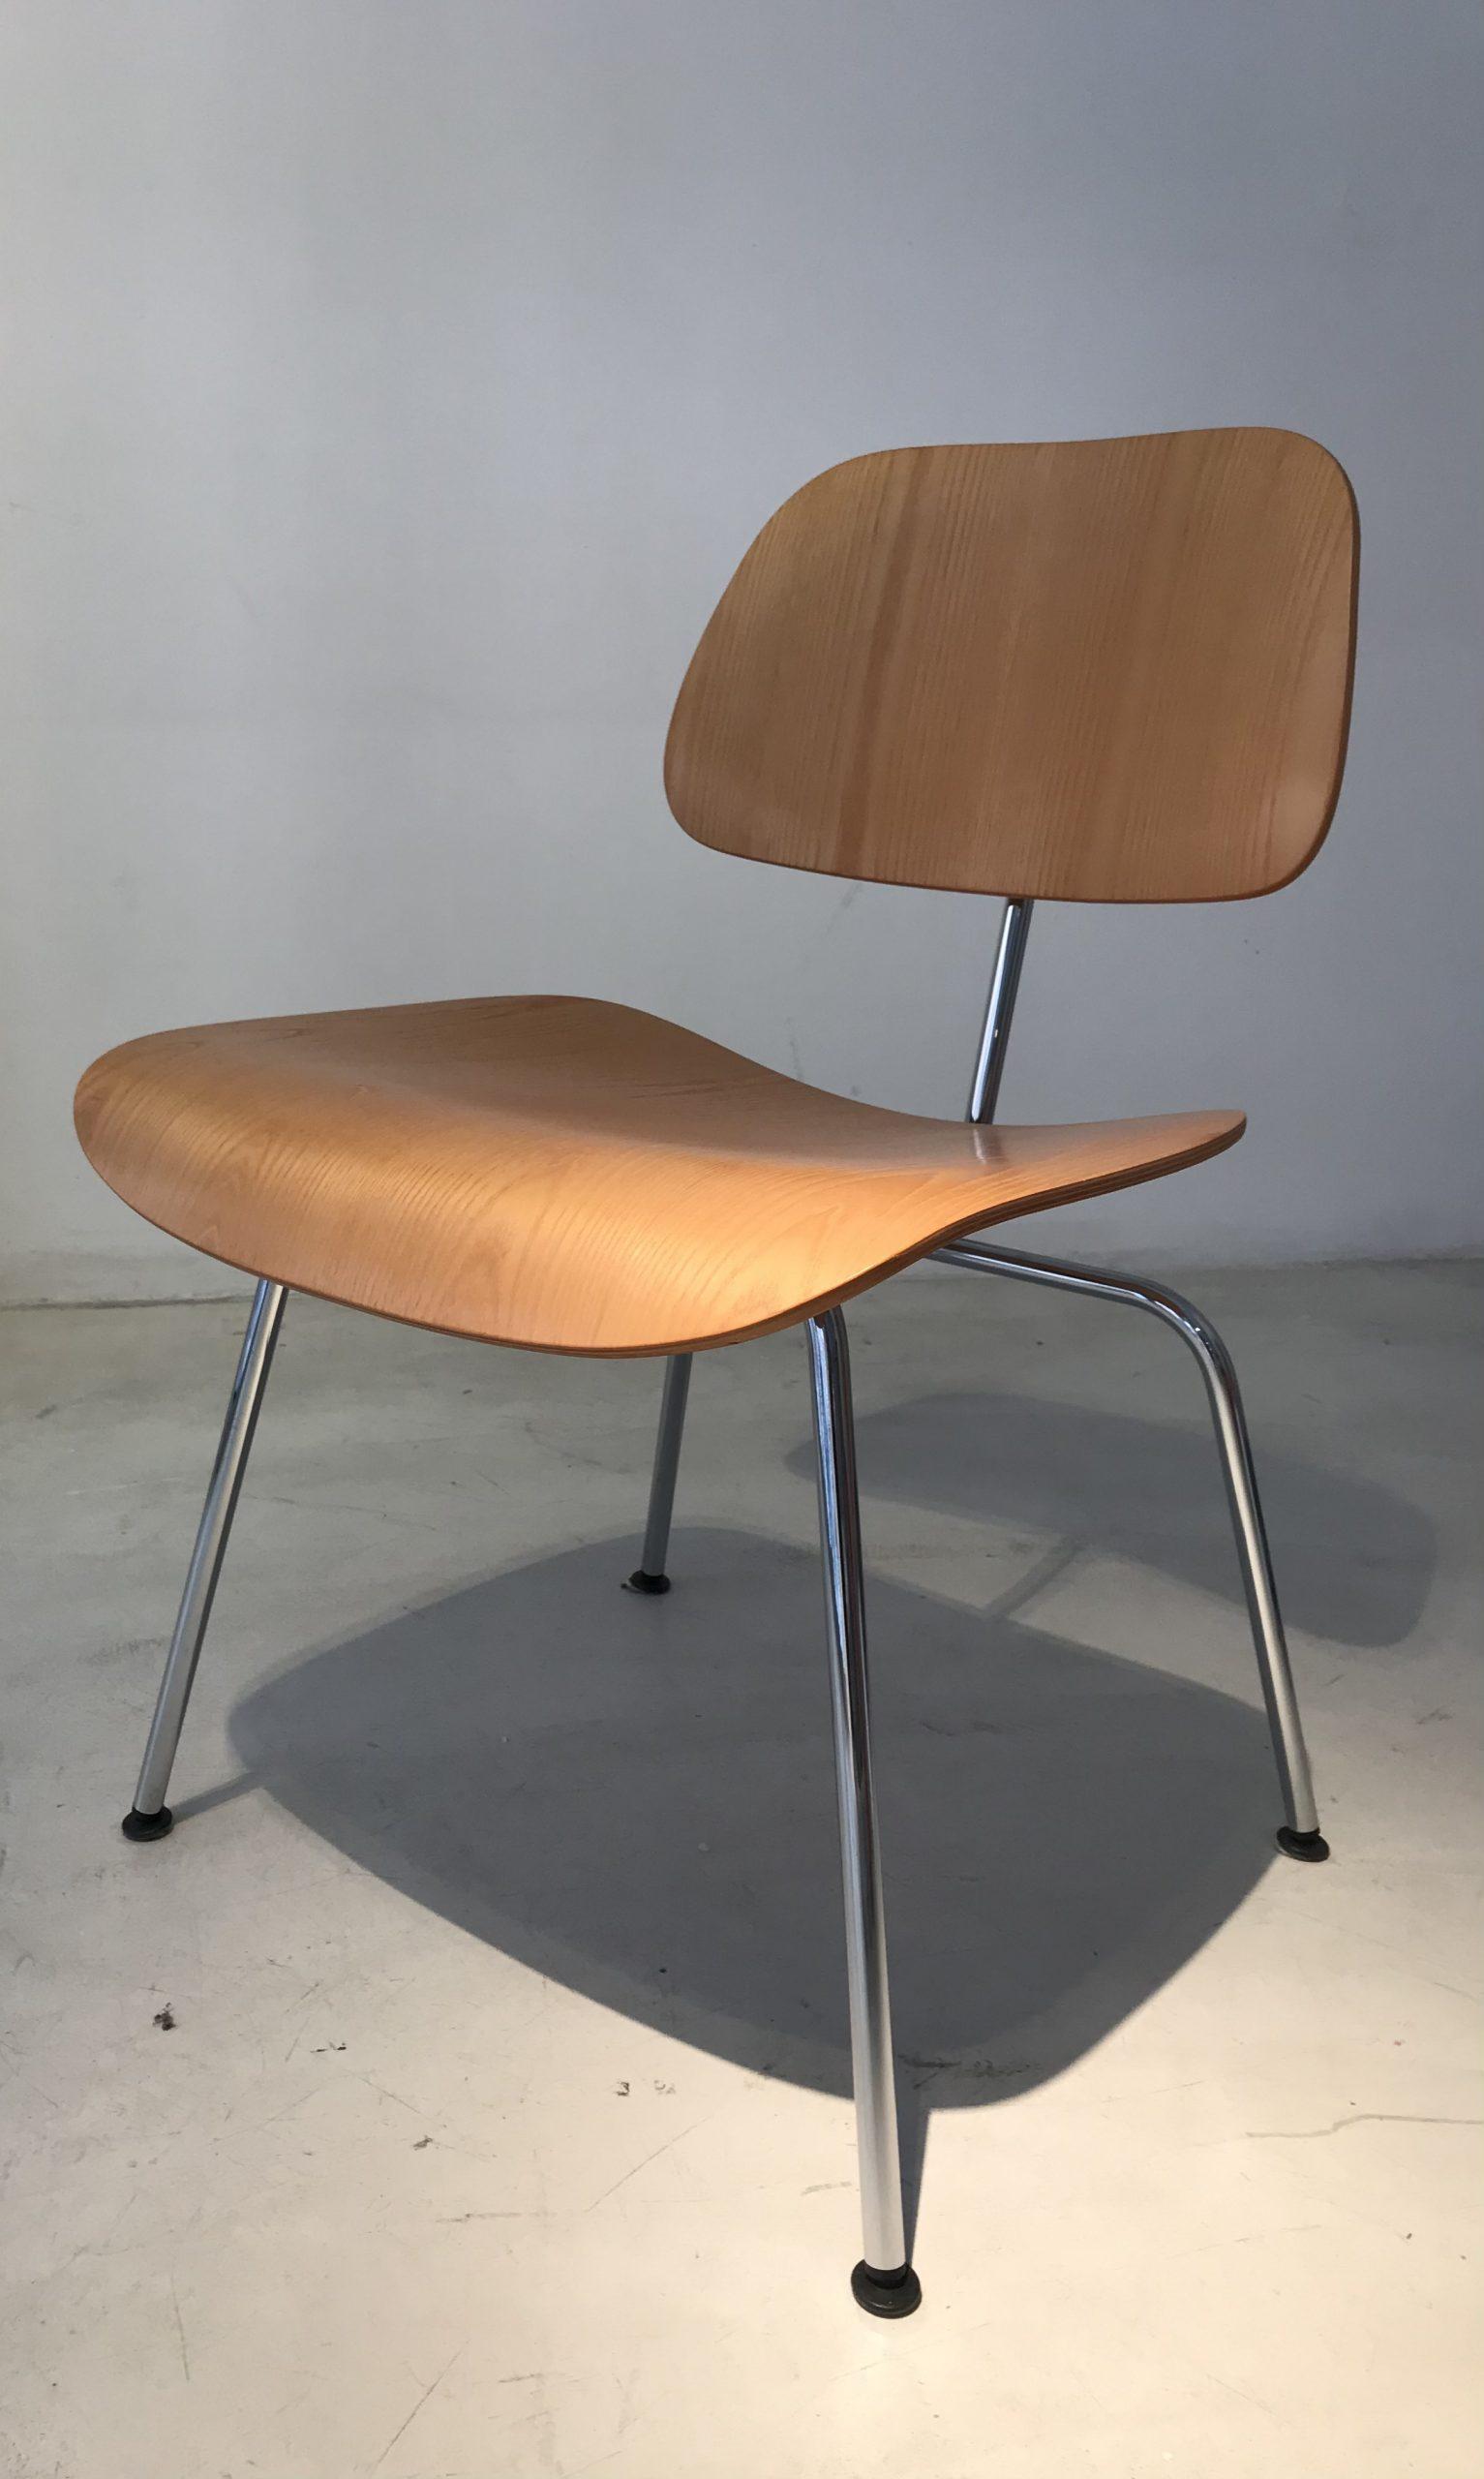 DMC Plywood Vitra originale Sedia Charles & Ray Eames